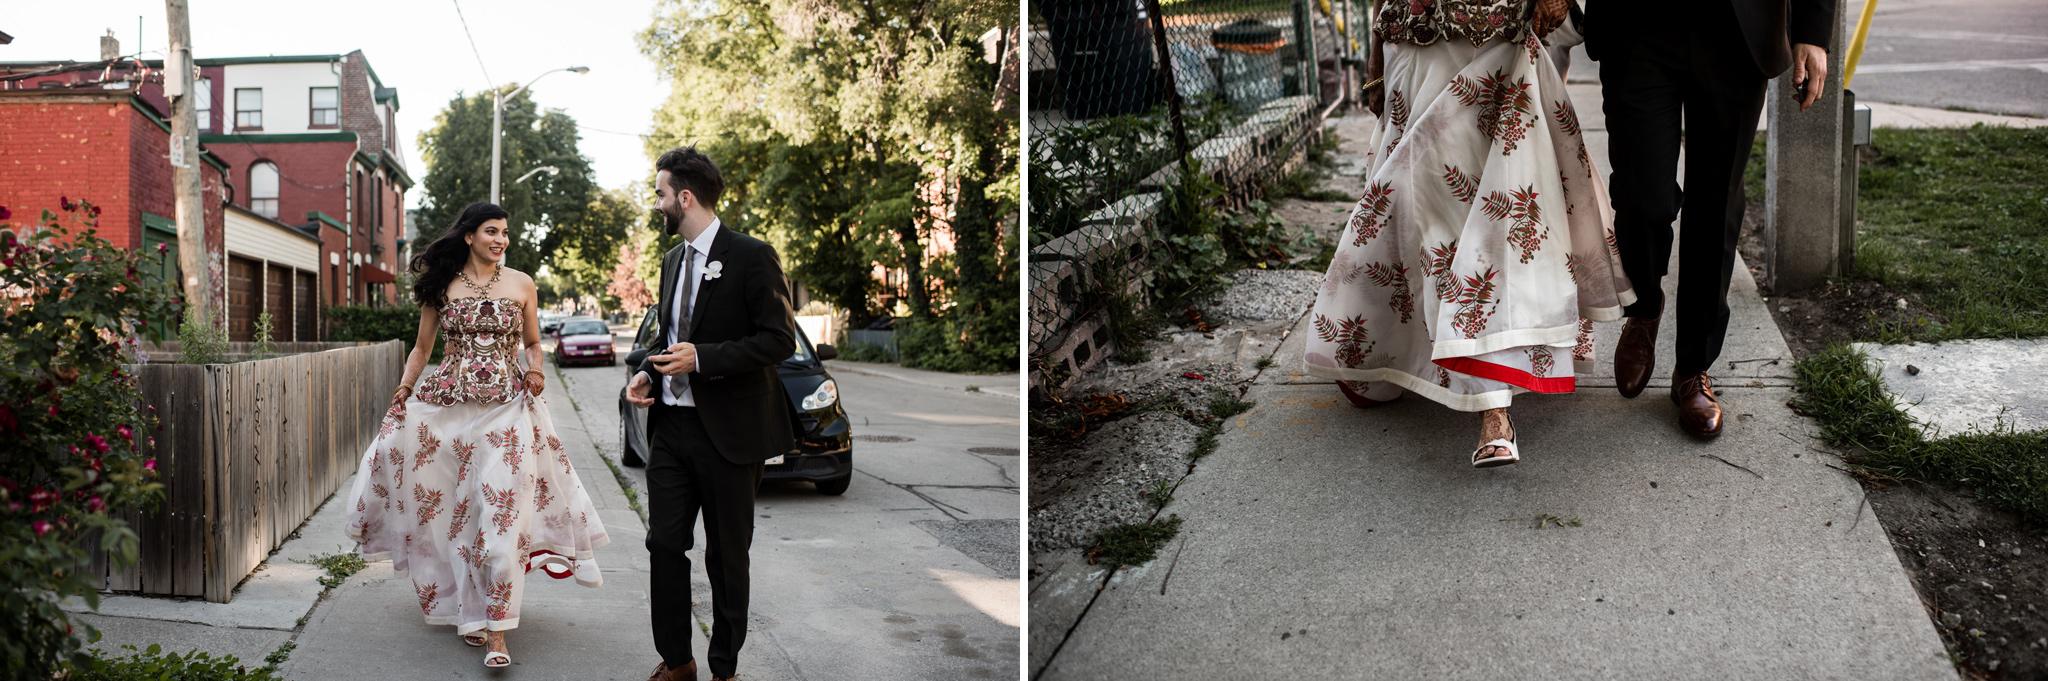 055-bride-groom-couple-wedding-photos-downtown-toronto-hotel-ocho.jpg